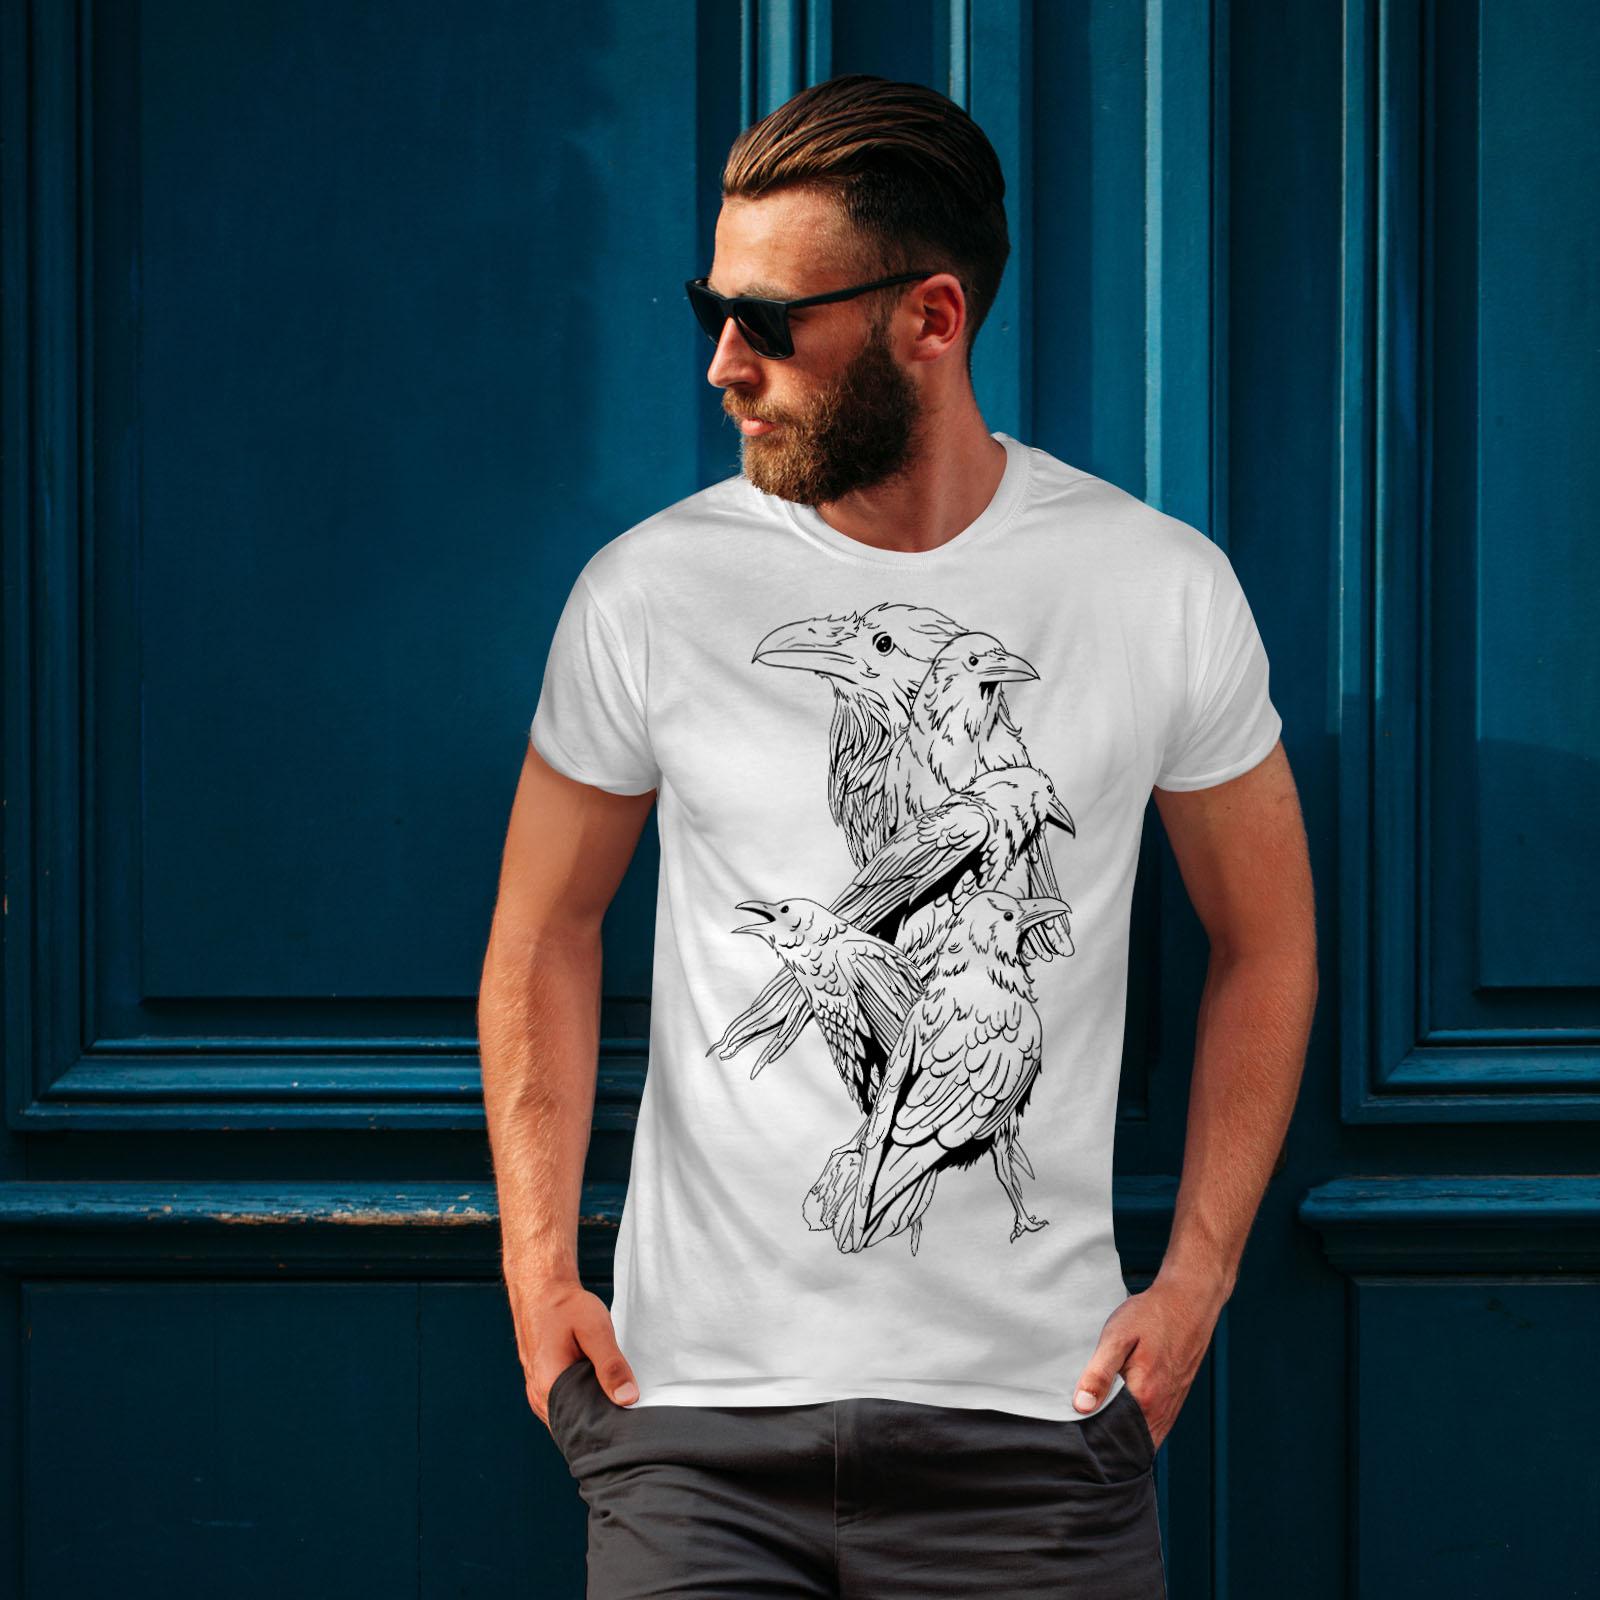 miniature 10 - Wellcoda Four Scary Raven Mens T-shirt, Crow Birds Graphic Design Printed Tee